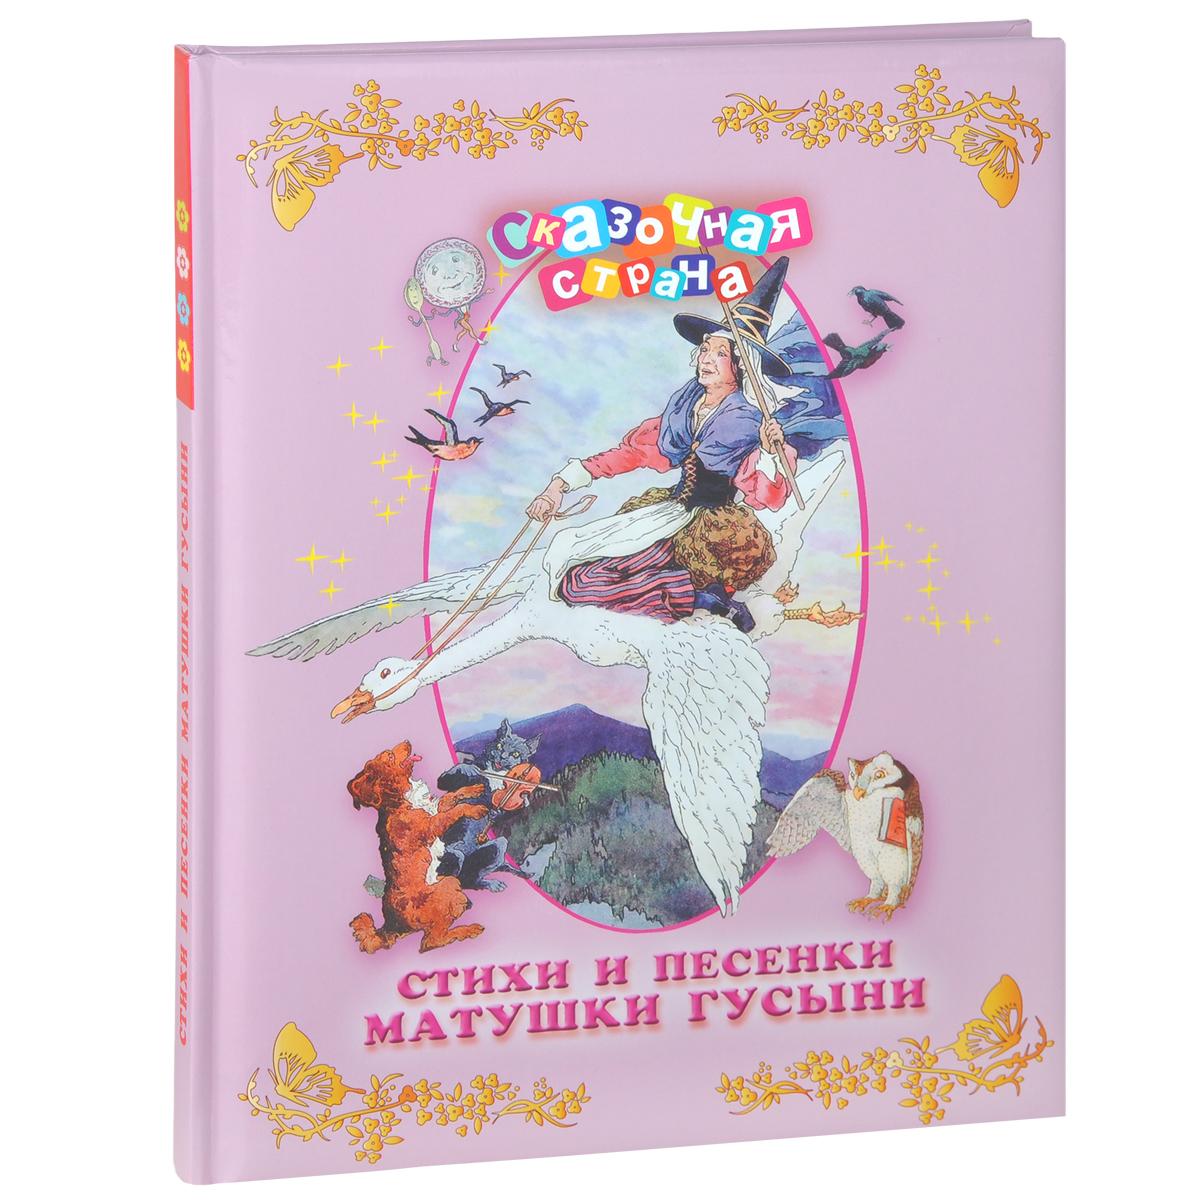 Стихи и песенки Матушки Гусыни ( 978-5-373-06162-9 )